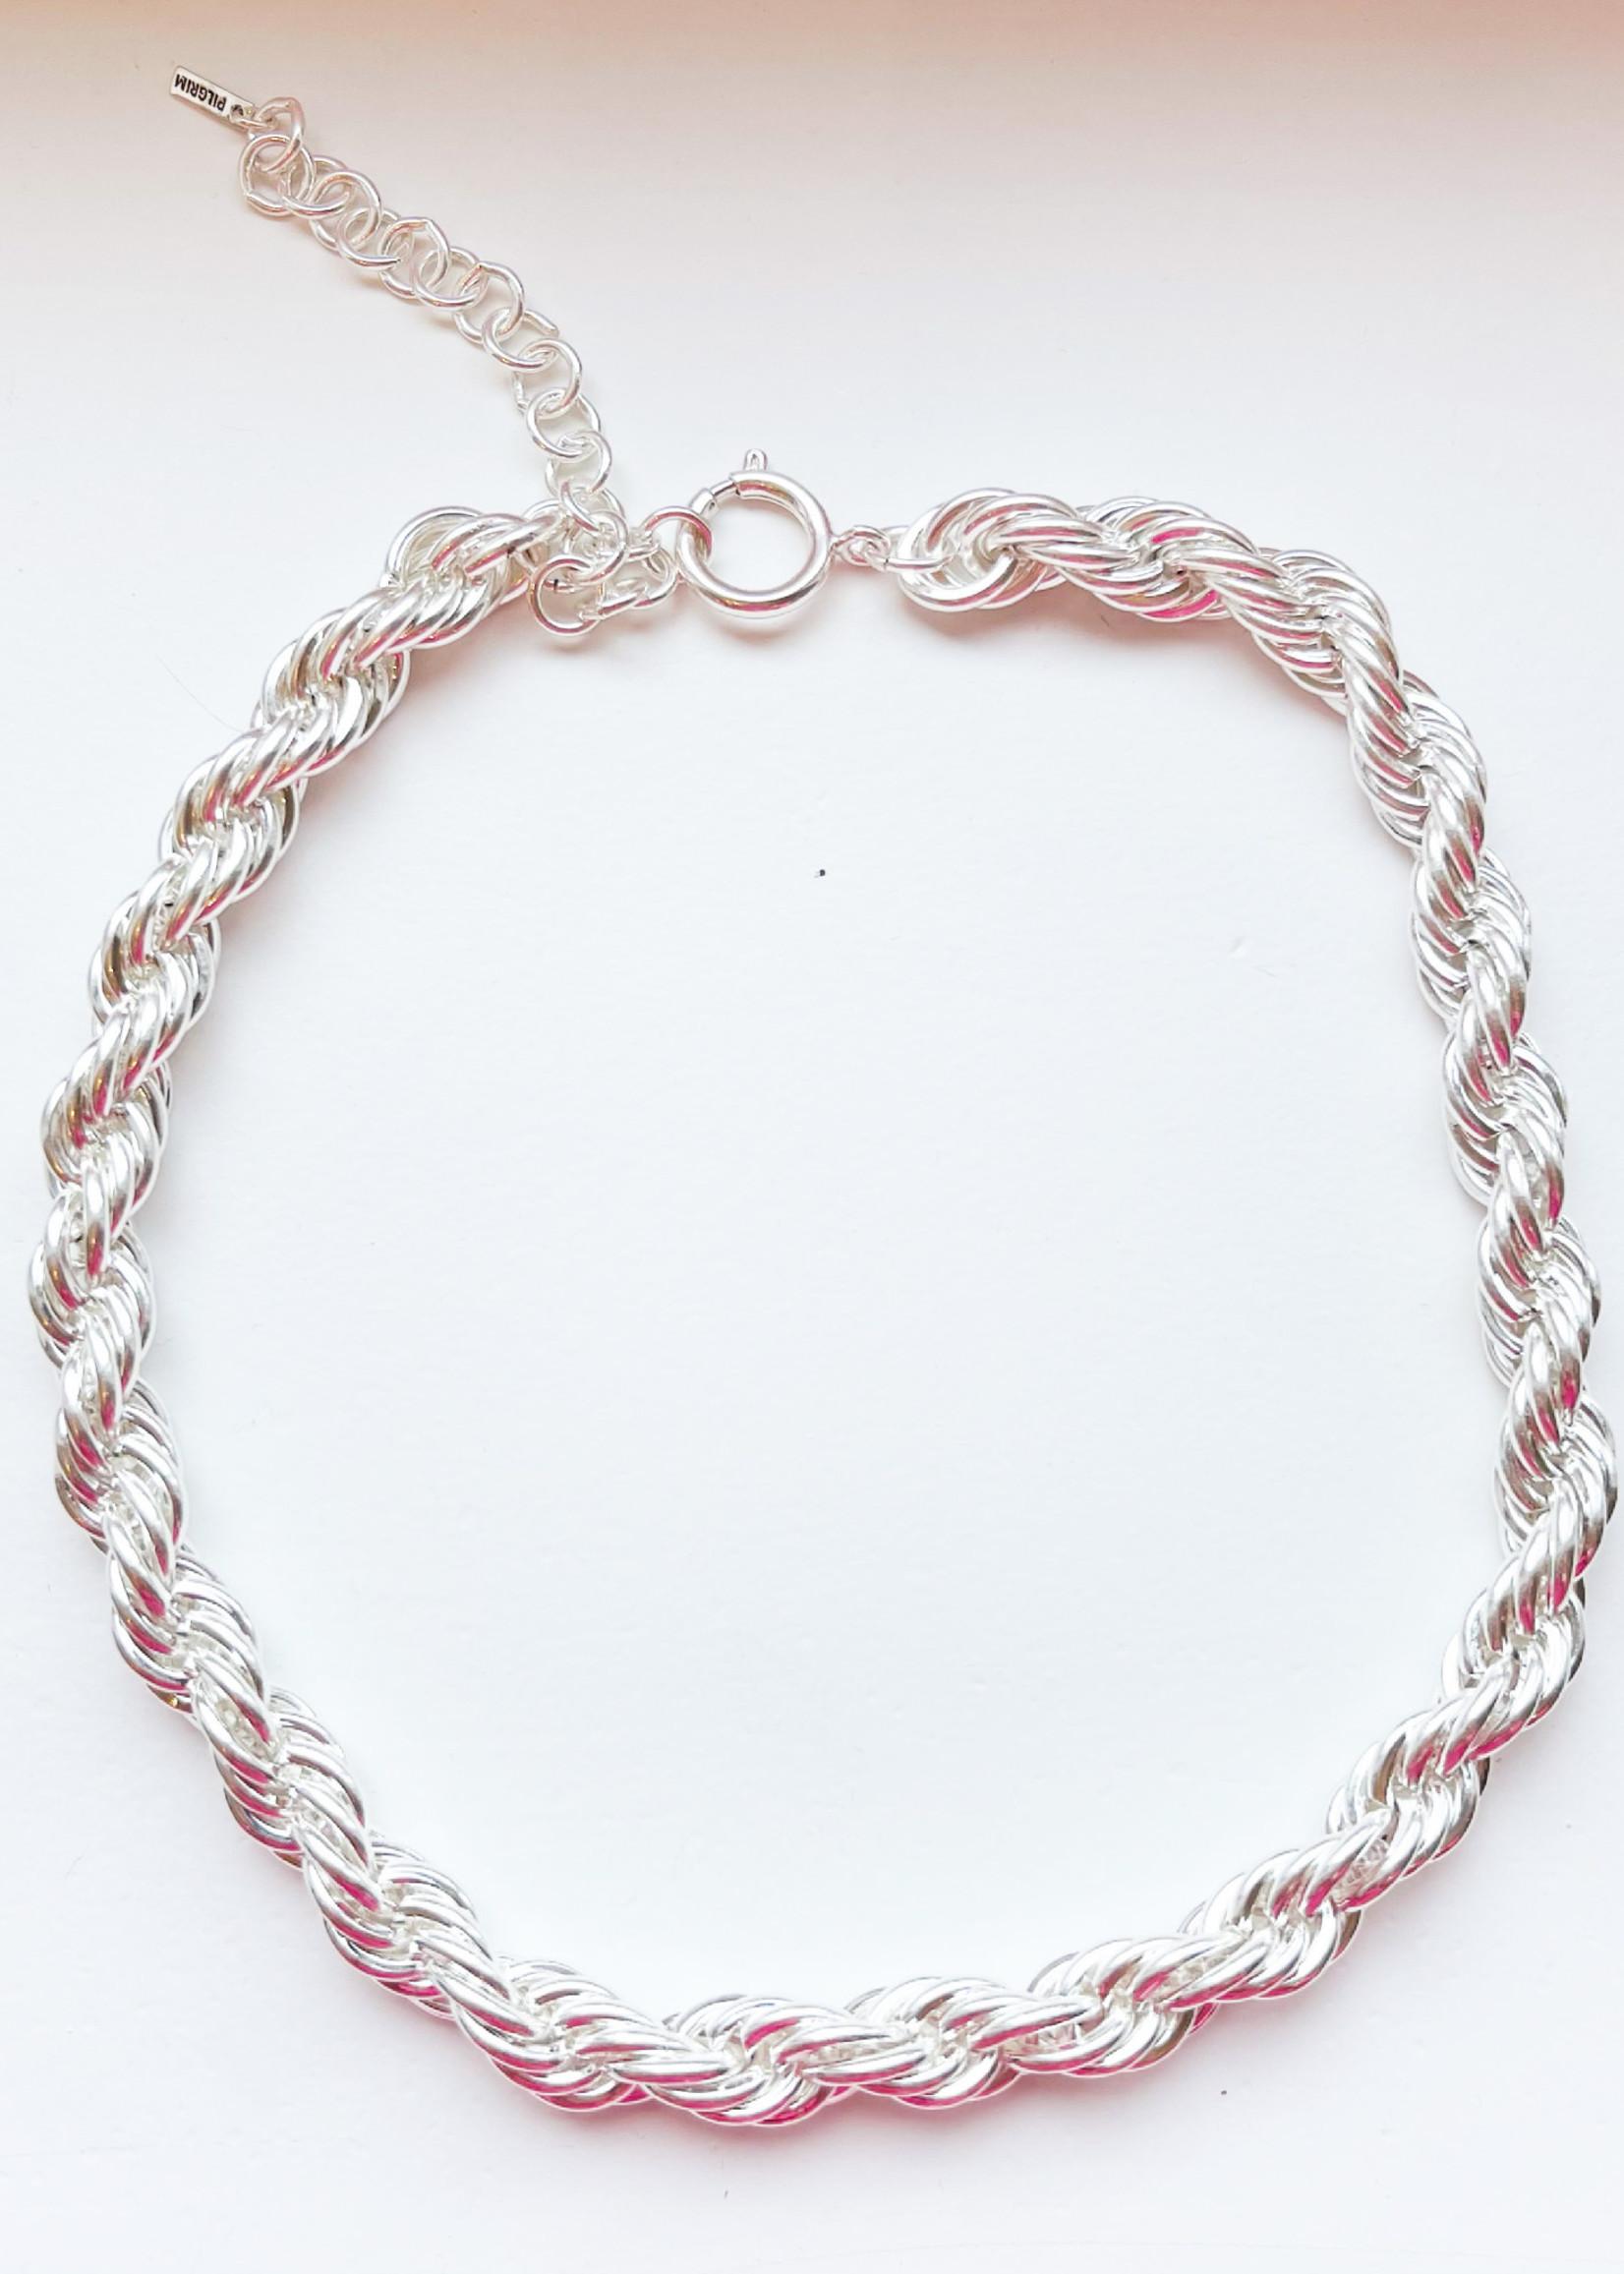 Guts & Goats Pilgrim Torsade Necklace Silver